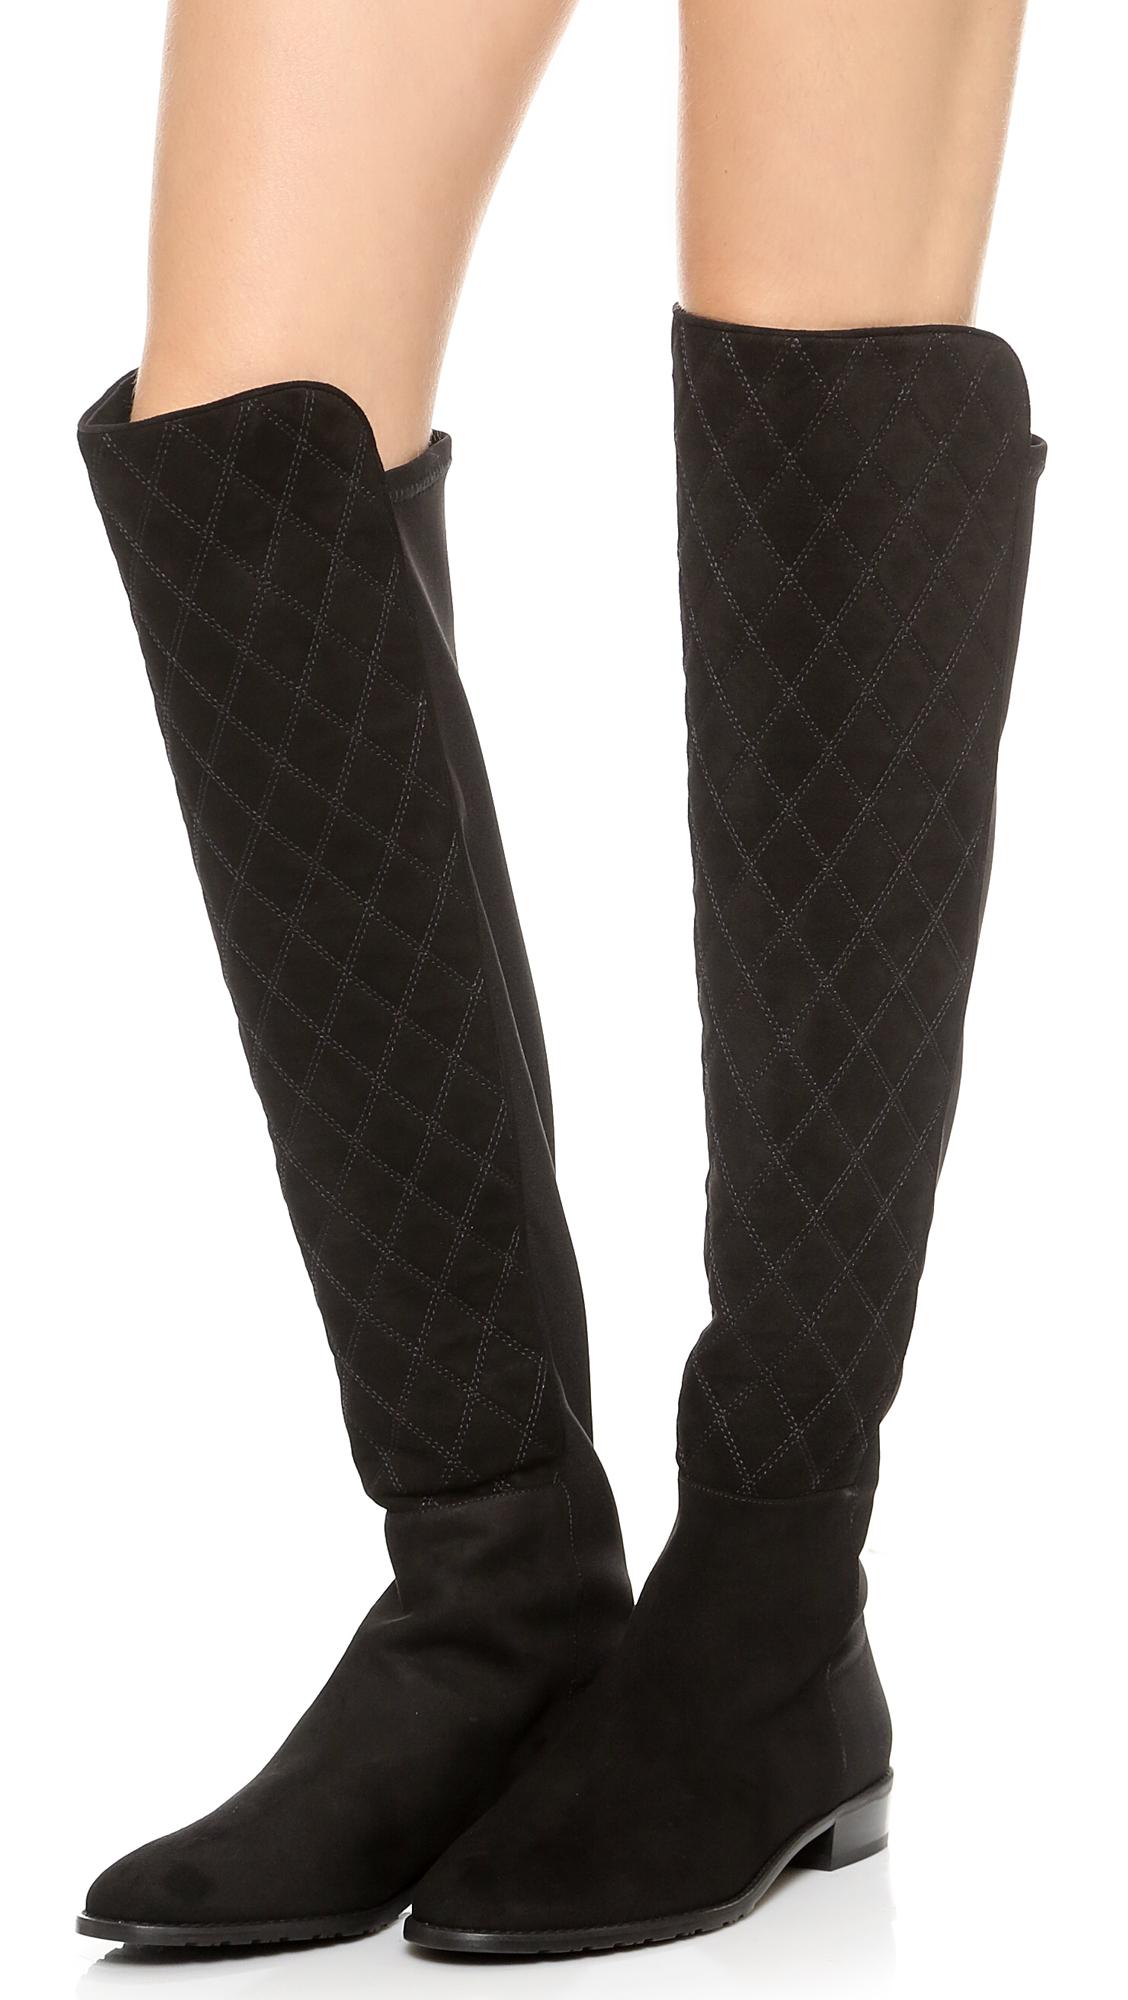 Stuart weitzman Quilt Stretch Suede Boots Black in Black | Lyst : stuart weitzman quilted boots - Adamdwight.com